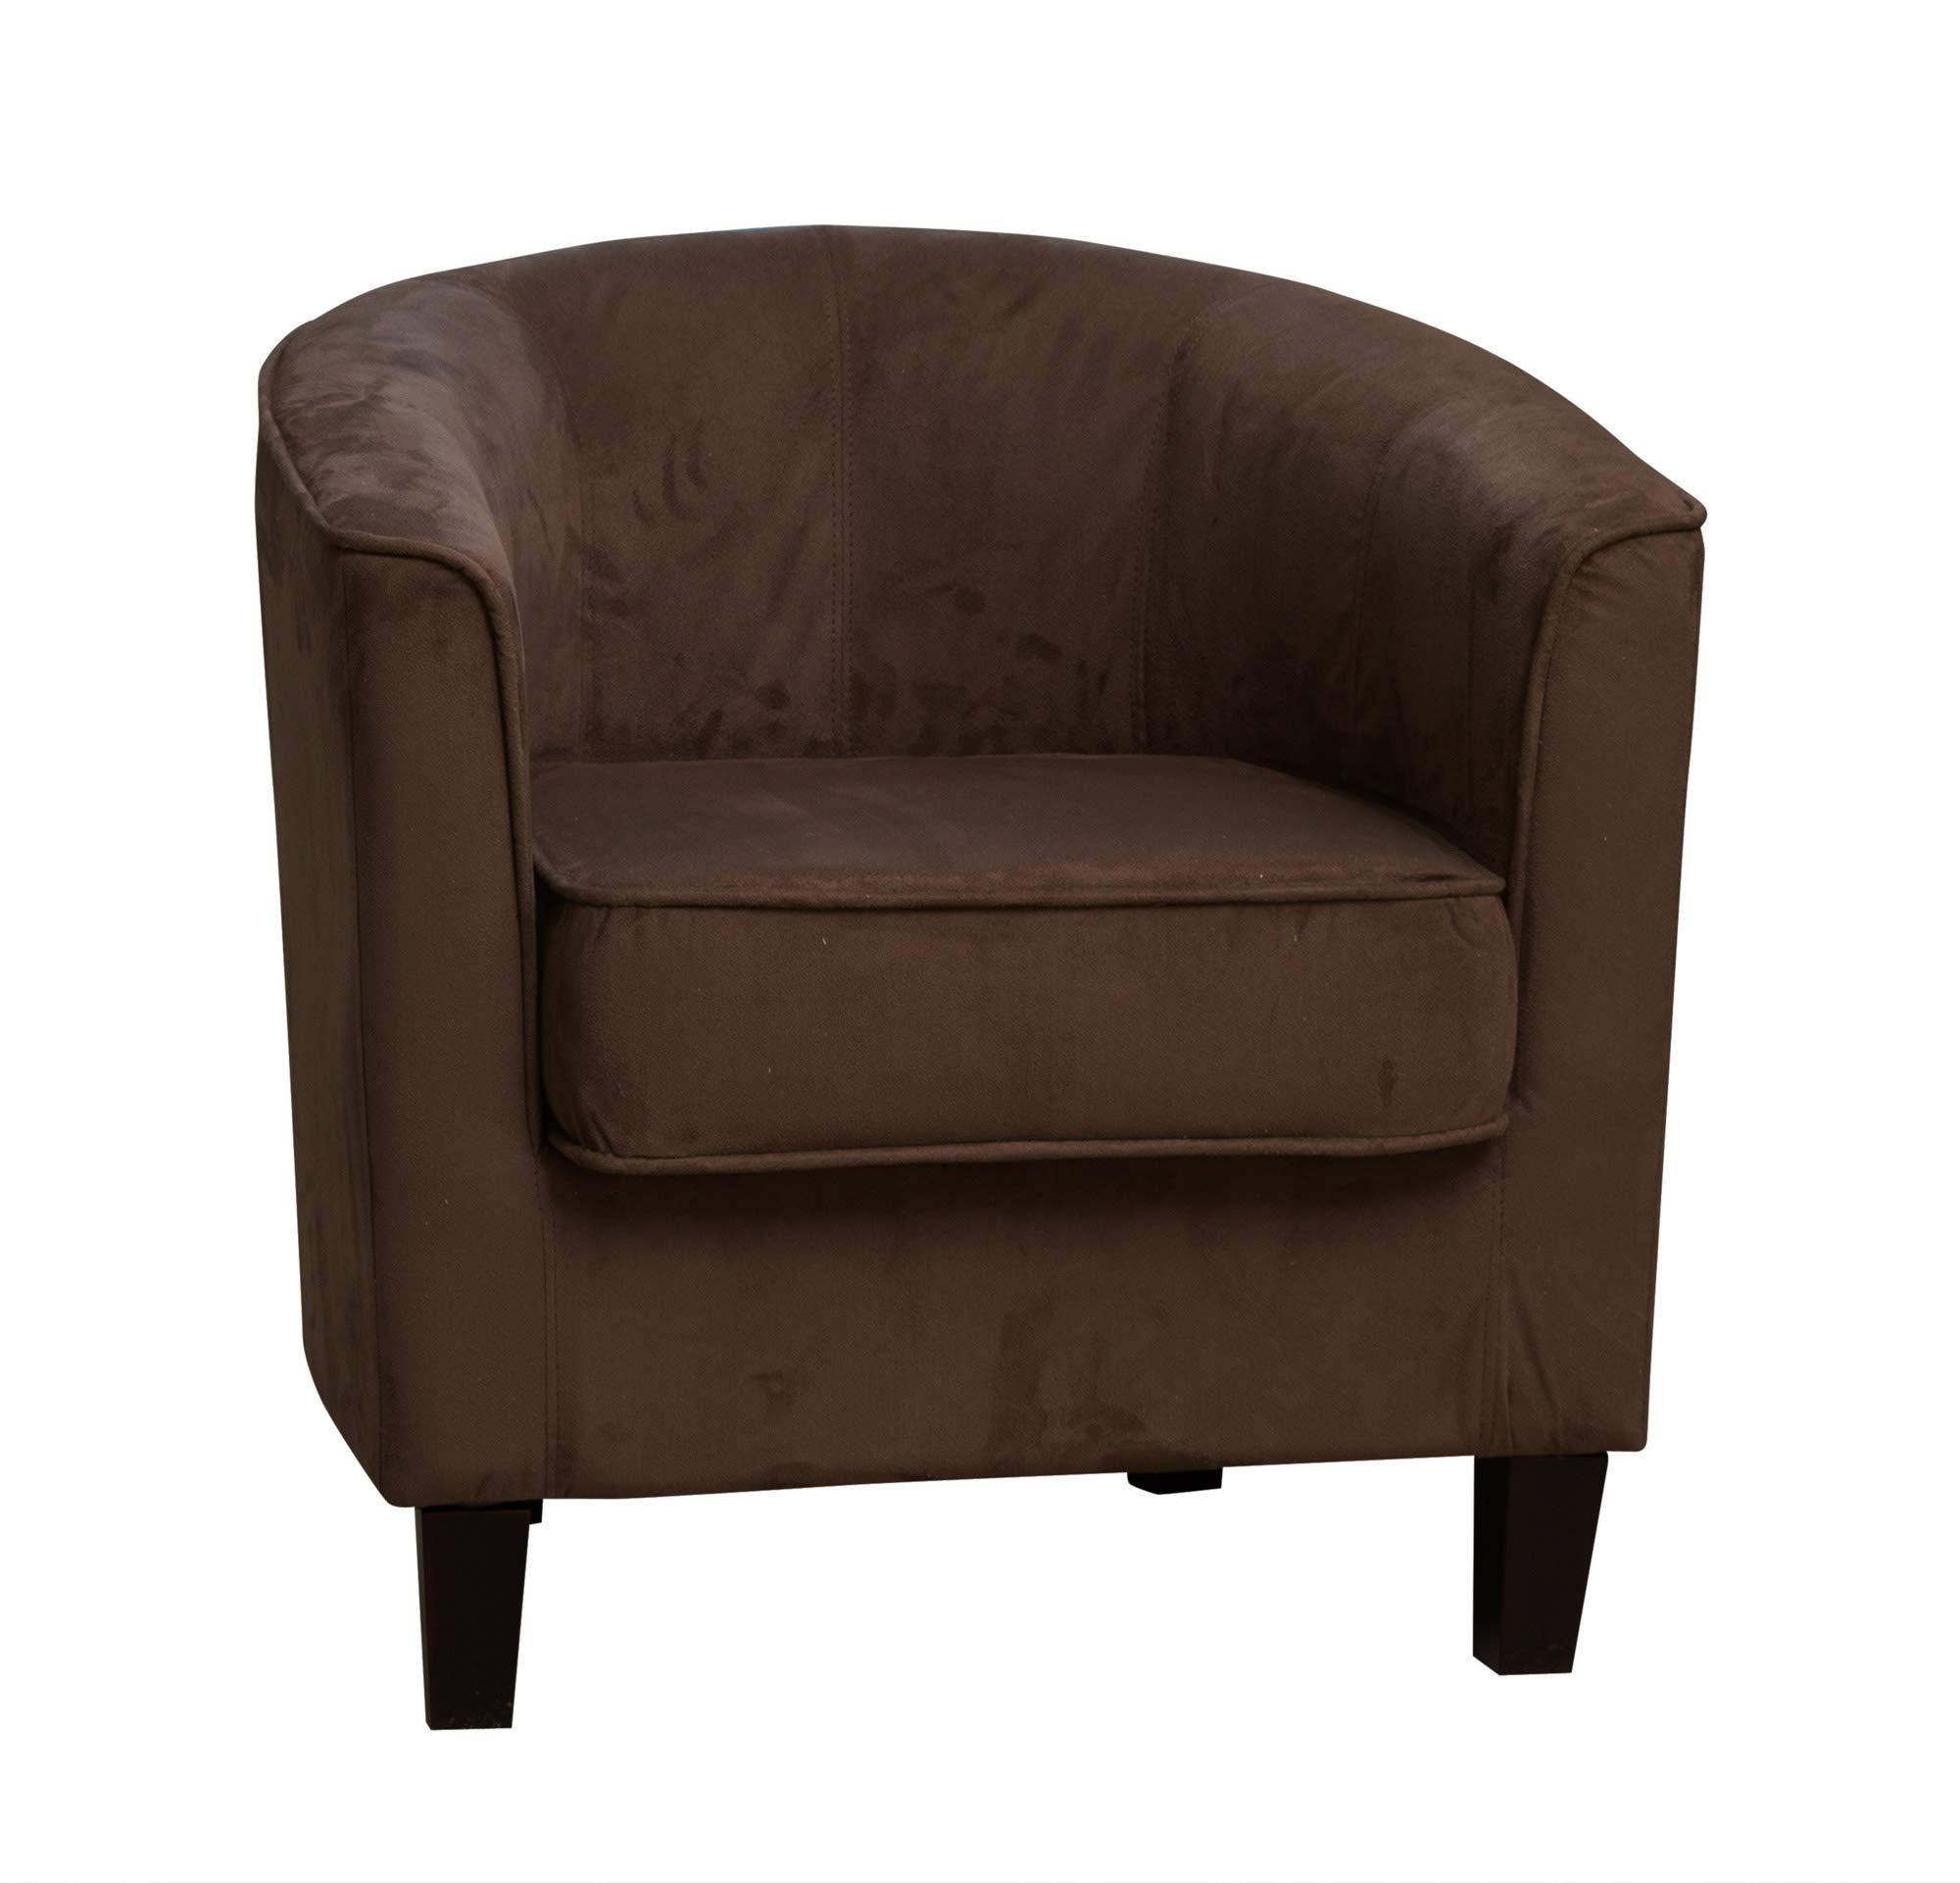 Sofa Collection Fabric Tub Chair/Armchair Seating (Cappuccino), Microfibre, 66x69x71 cm